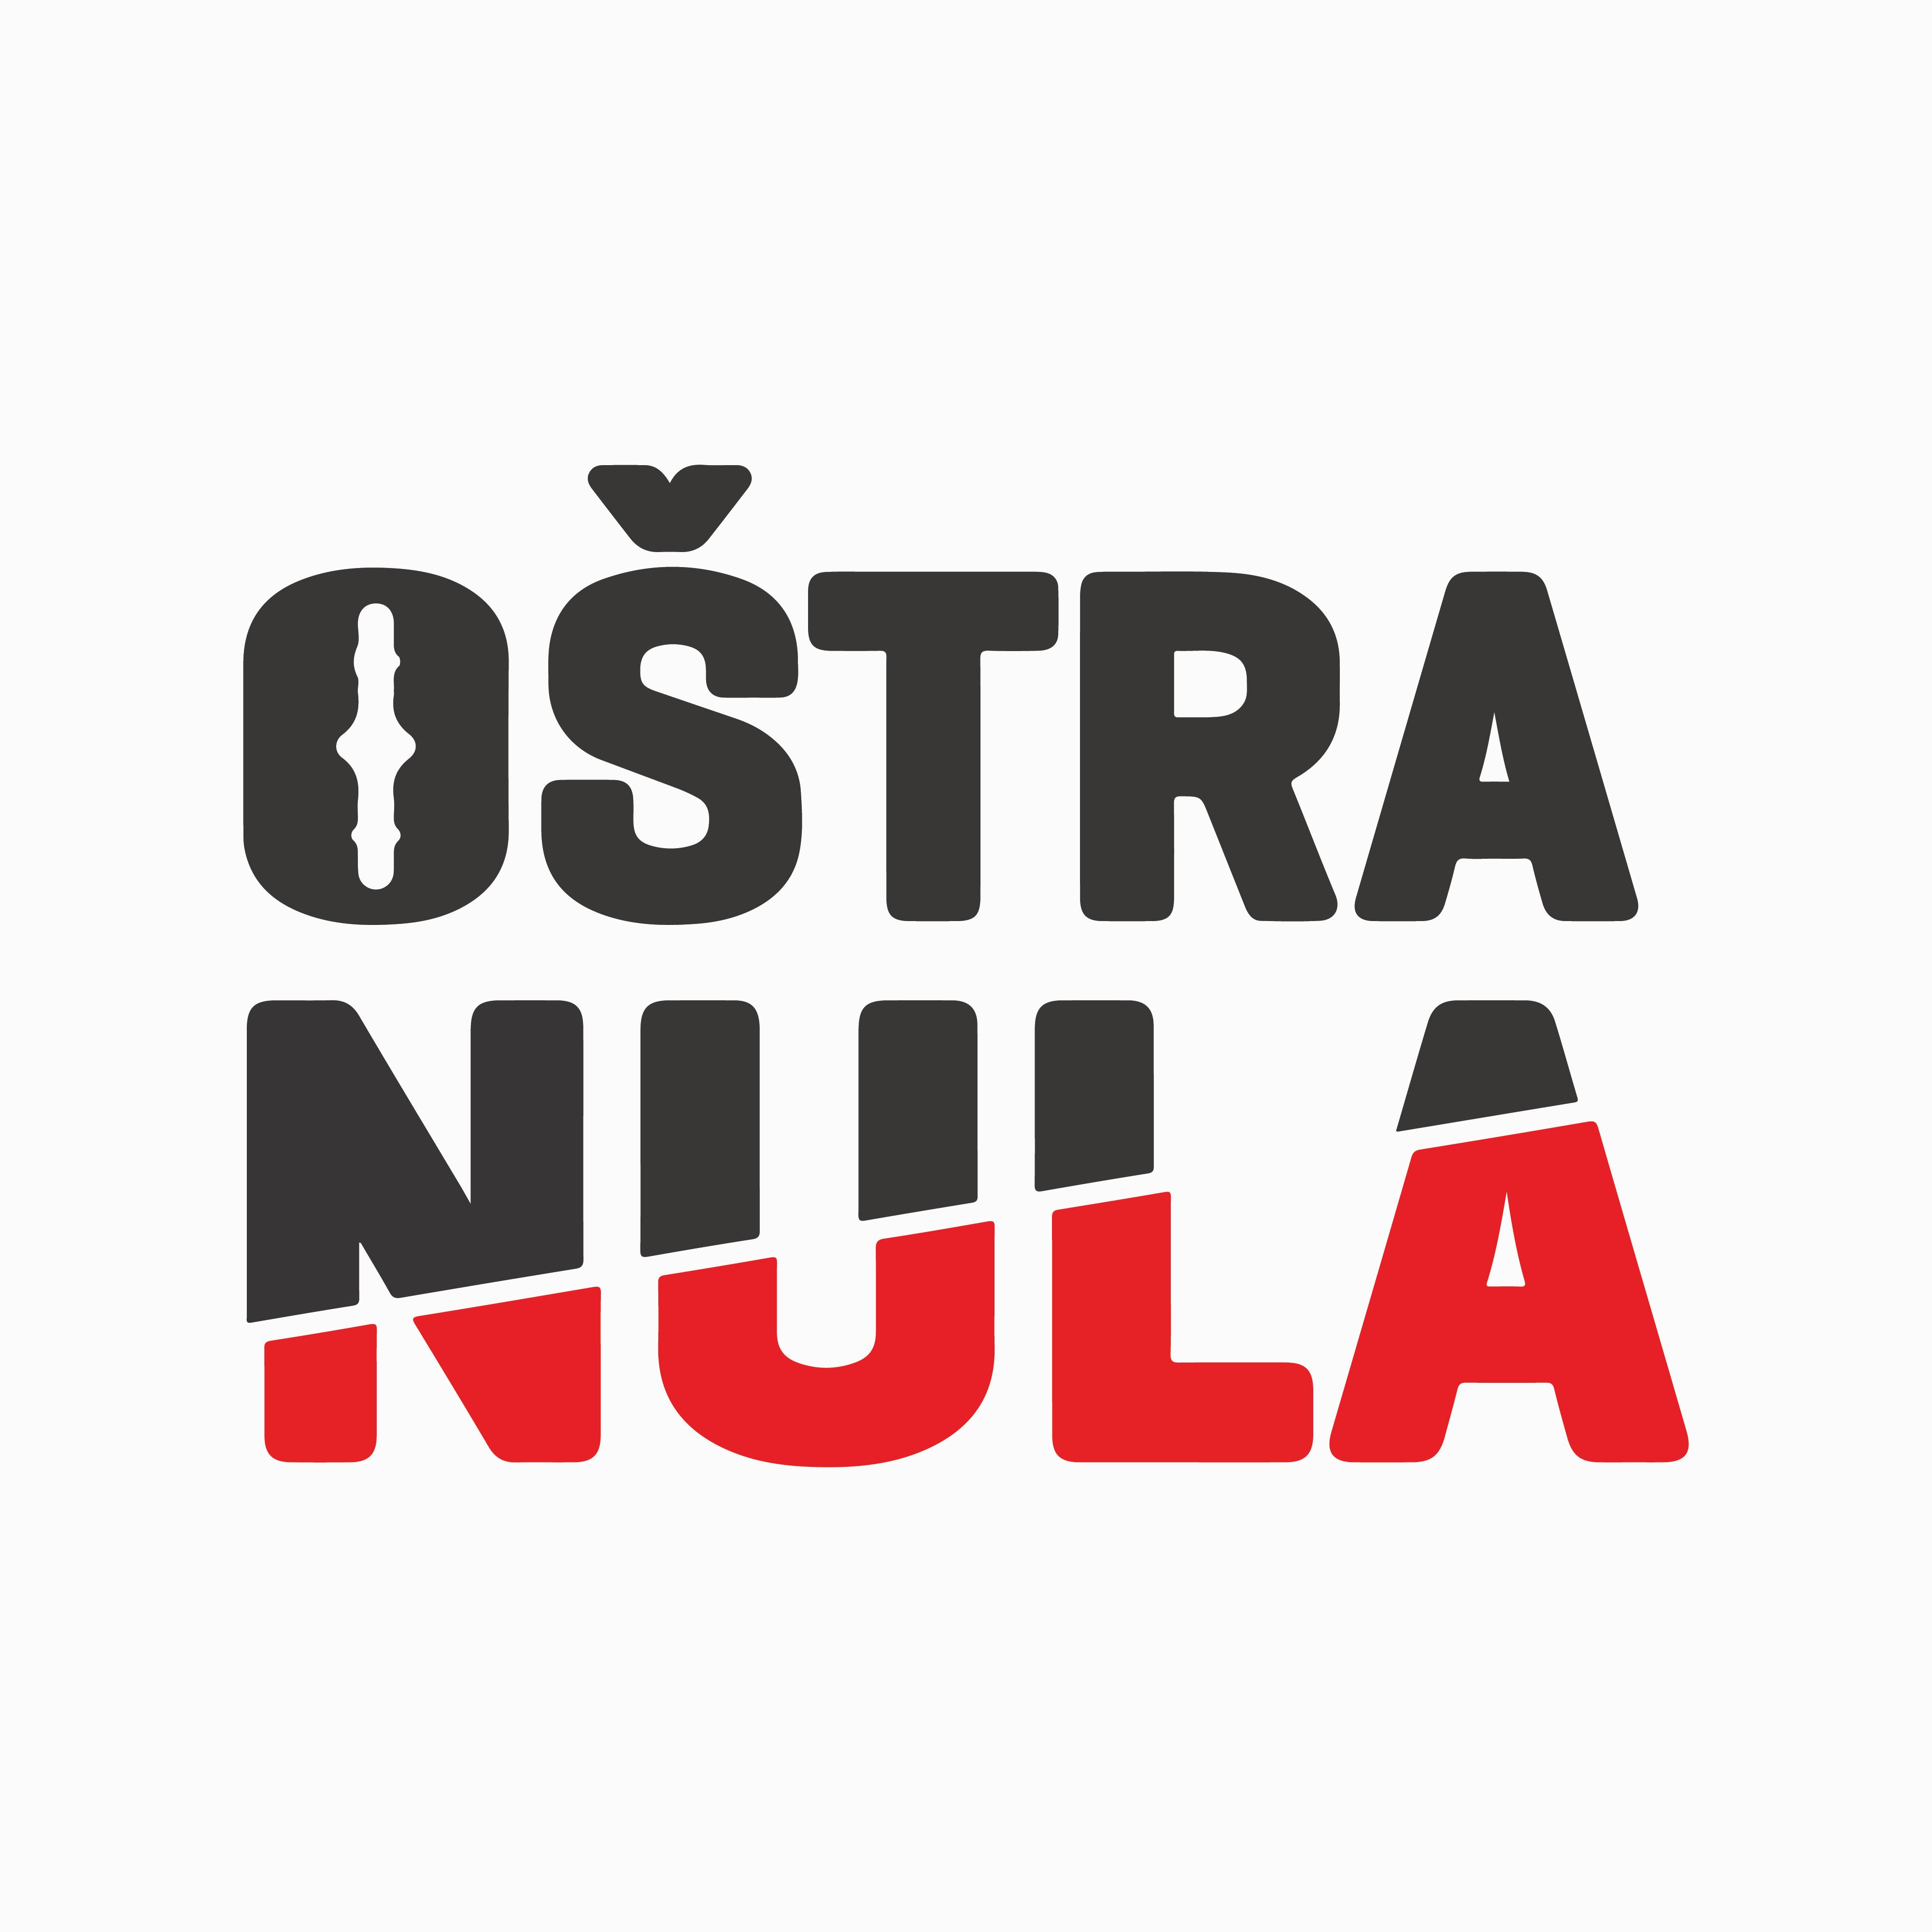 Oštra Nula